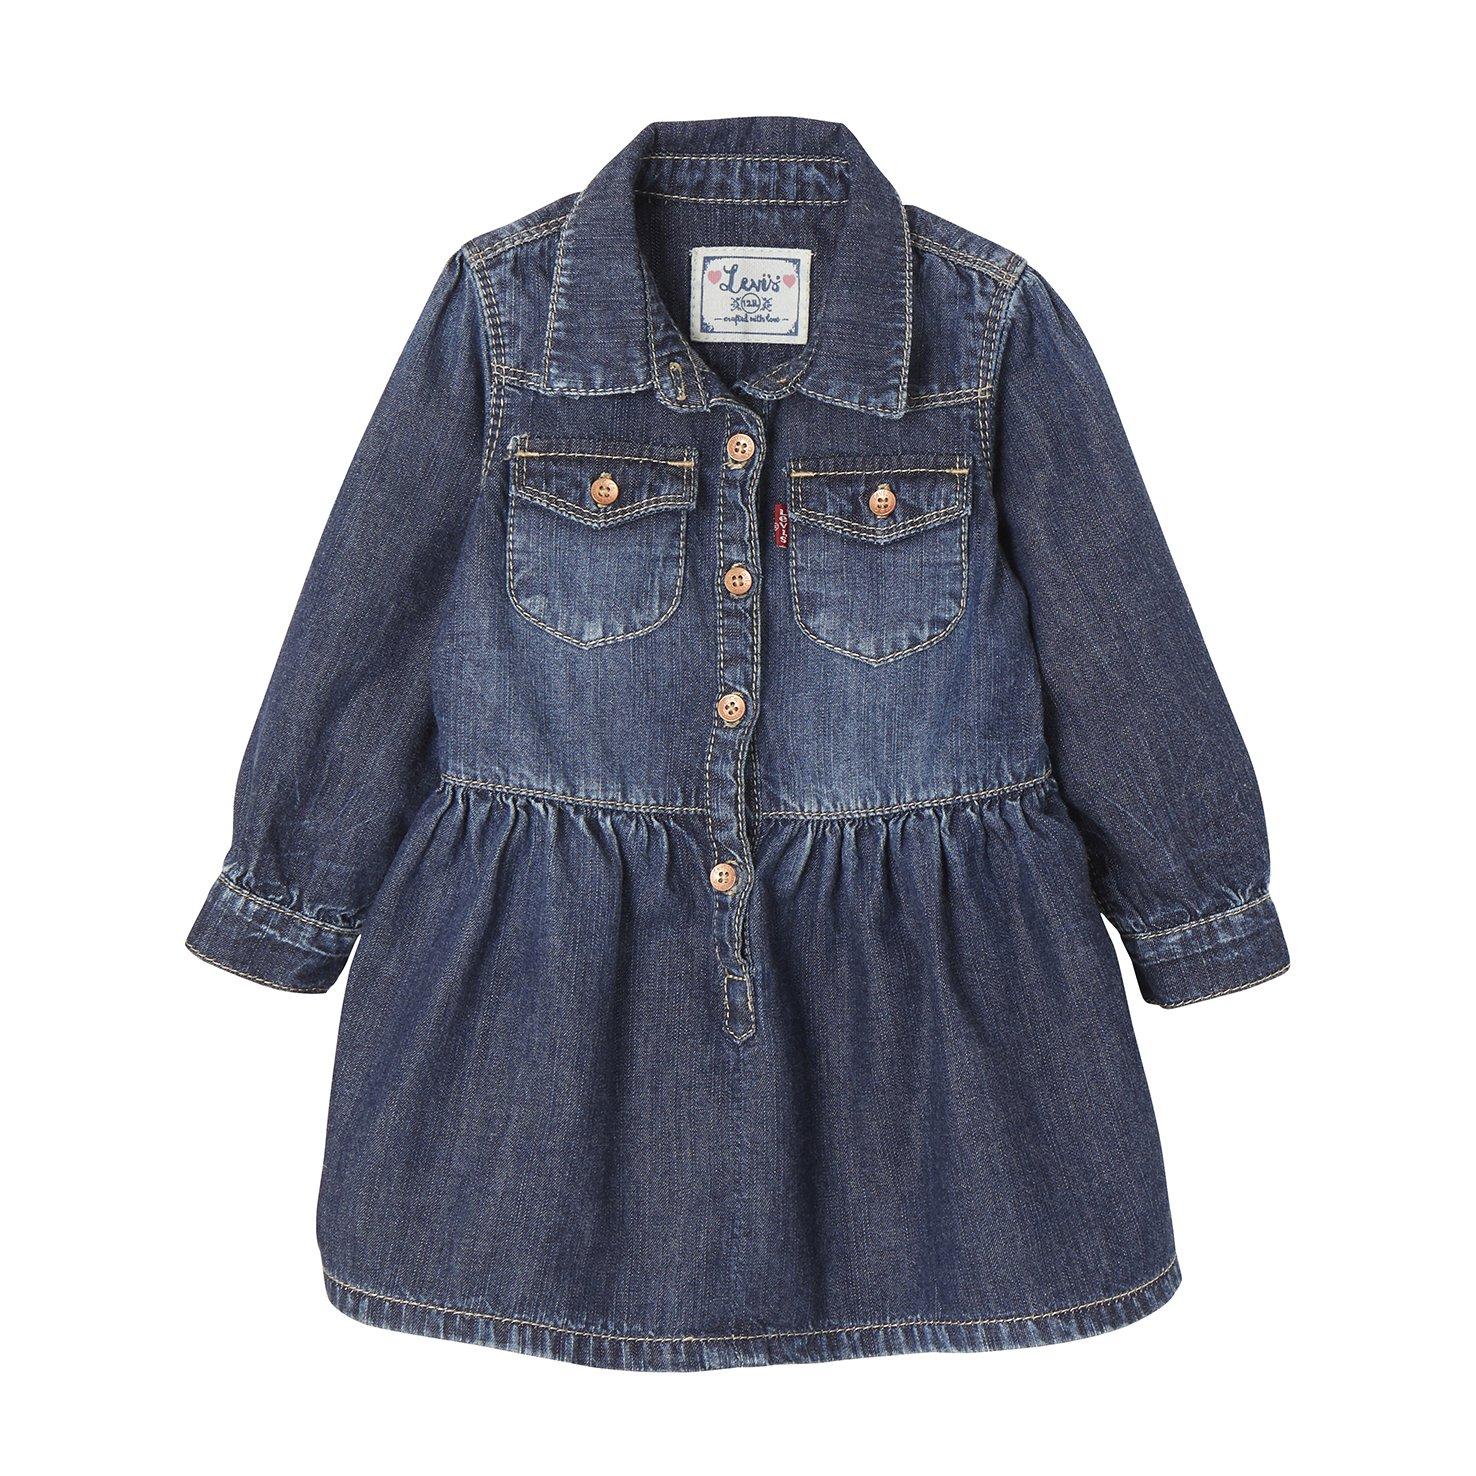 Levi's Kids Baby Girls' Clothing Set Levi' s Kids NM30504